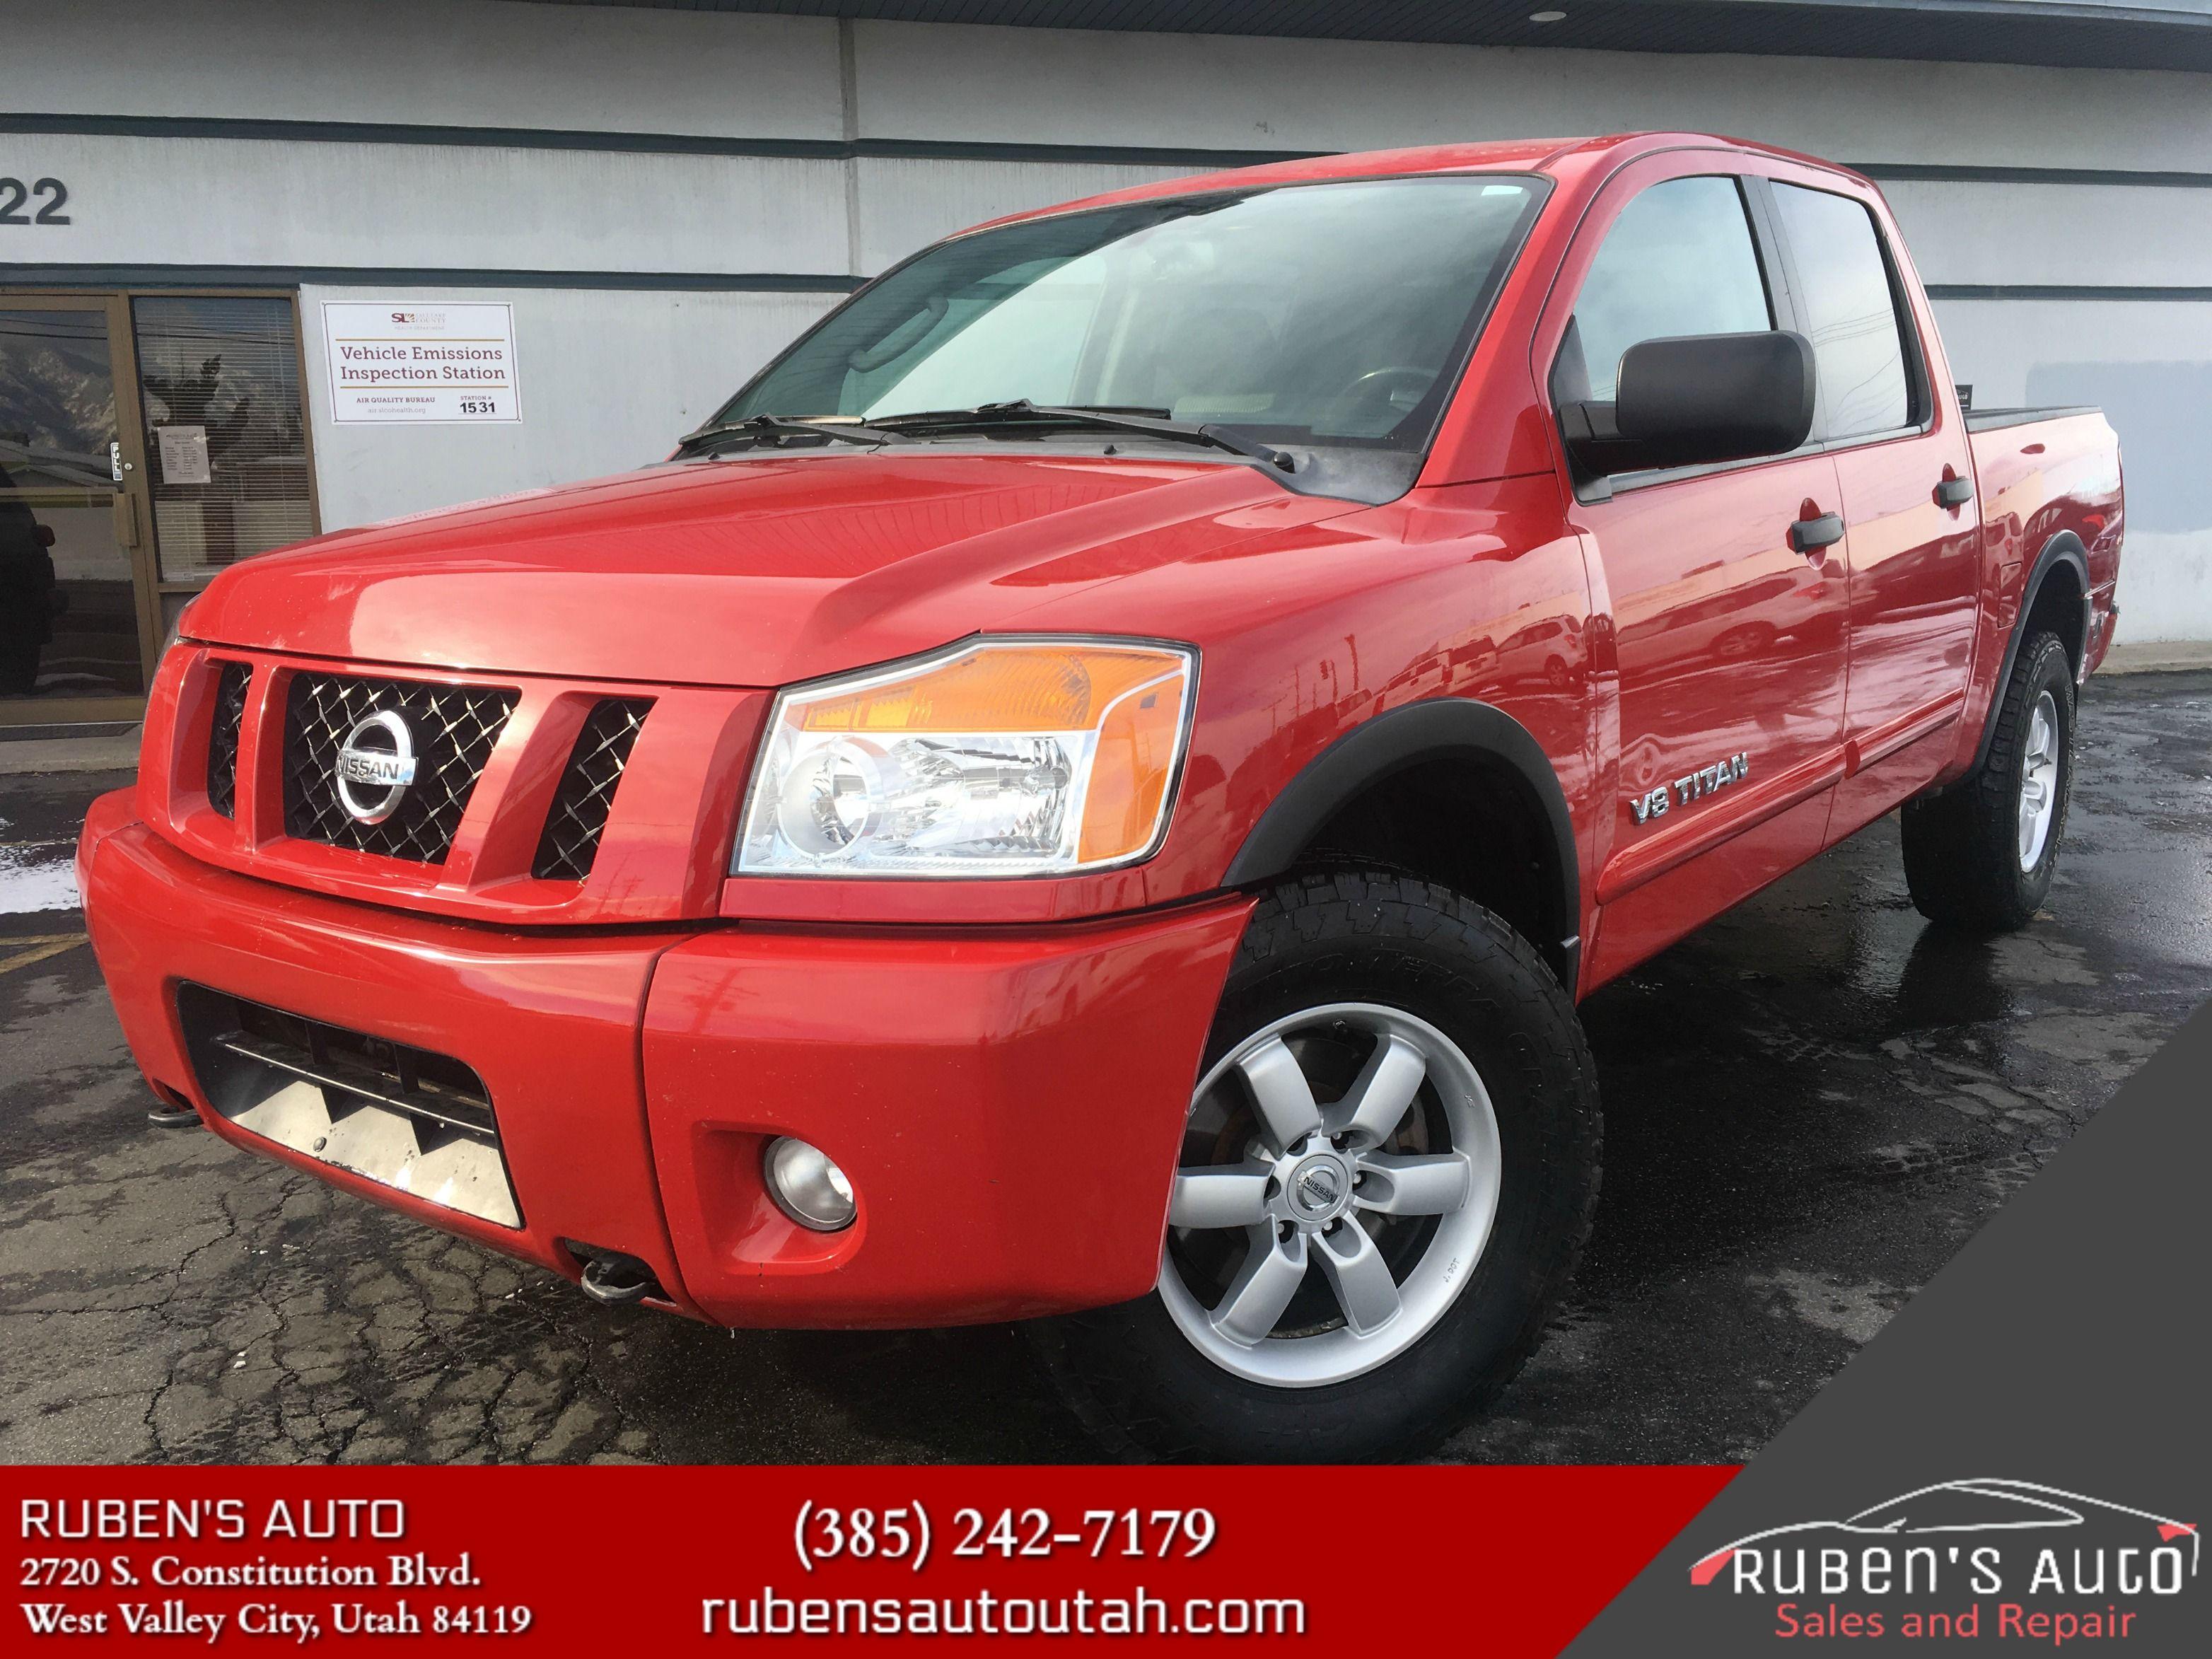 Ruben'S Auto Sales >> Ruben S Auto Sales And Repair Rubensauto17 On Pinterest